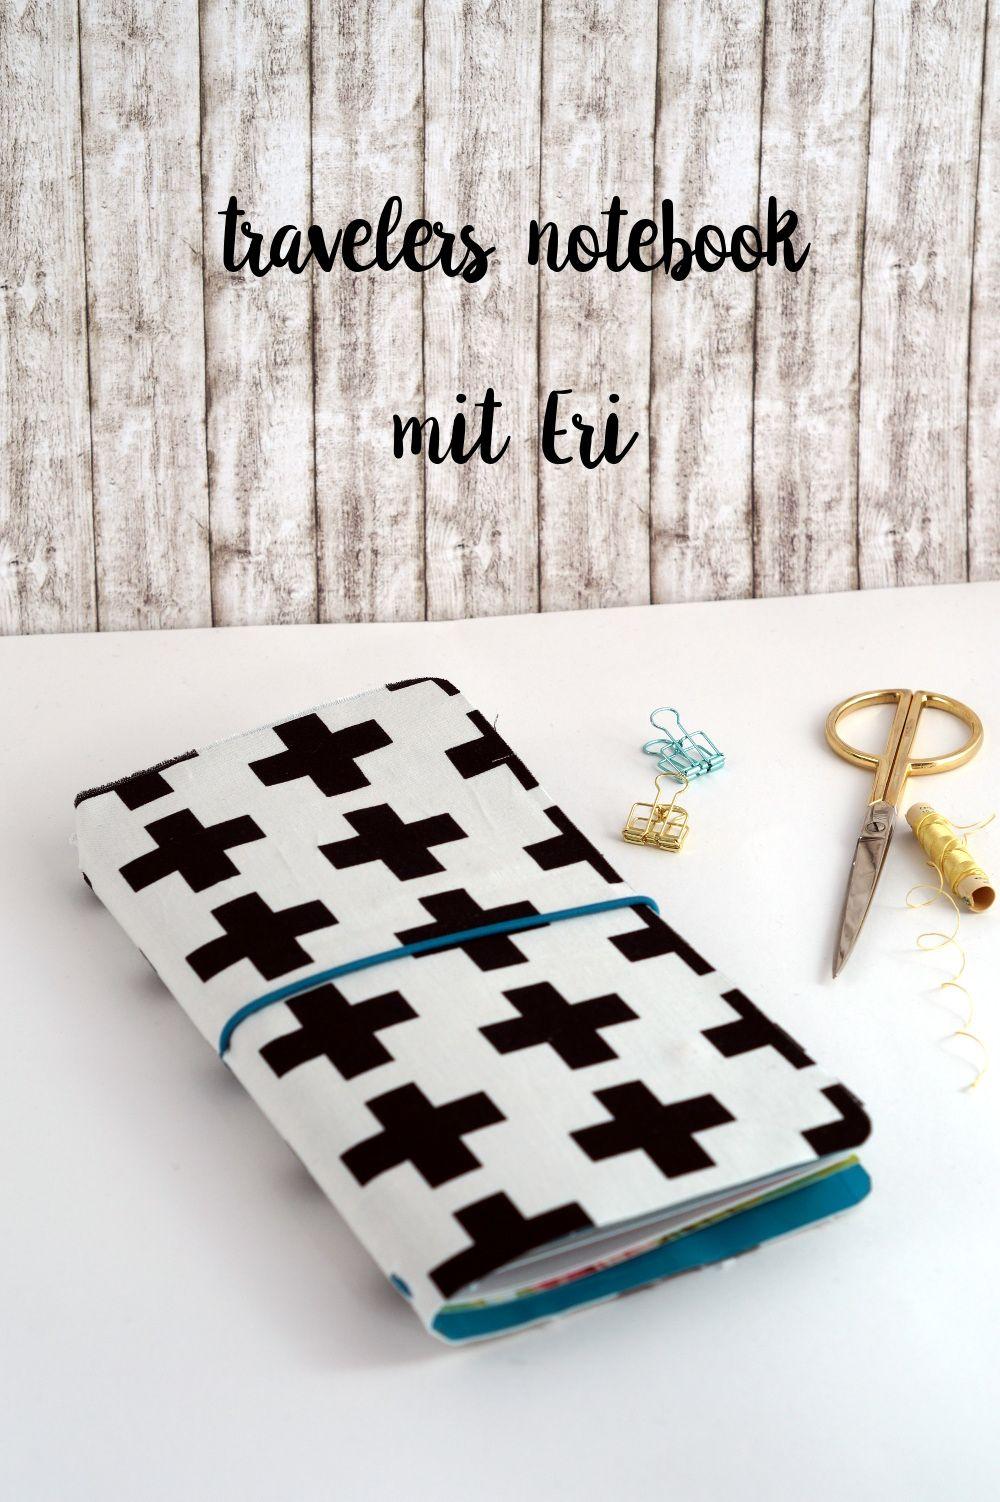 scrapbook werkstatt inspirationsgalerie minialbum werkstatt travelers notebook selbstgemacht. Black Bedroom Furniture Sets. Home Design Ideas